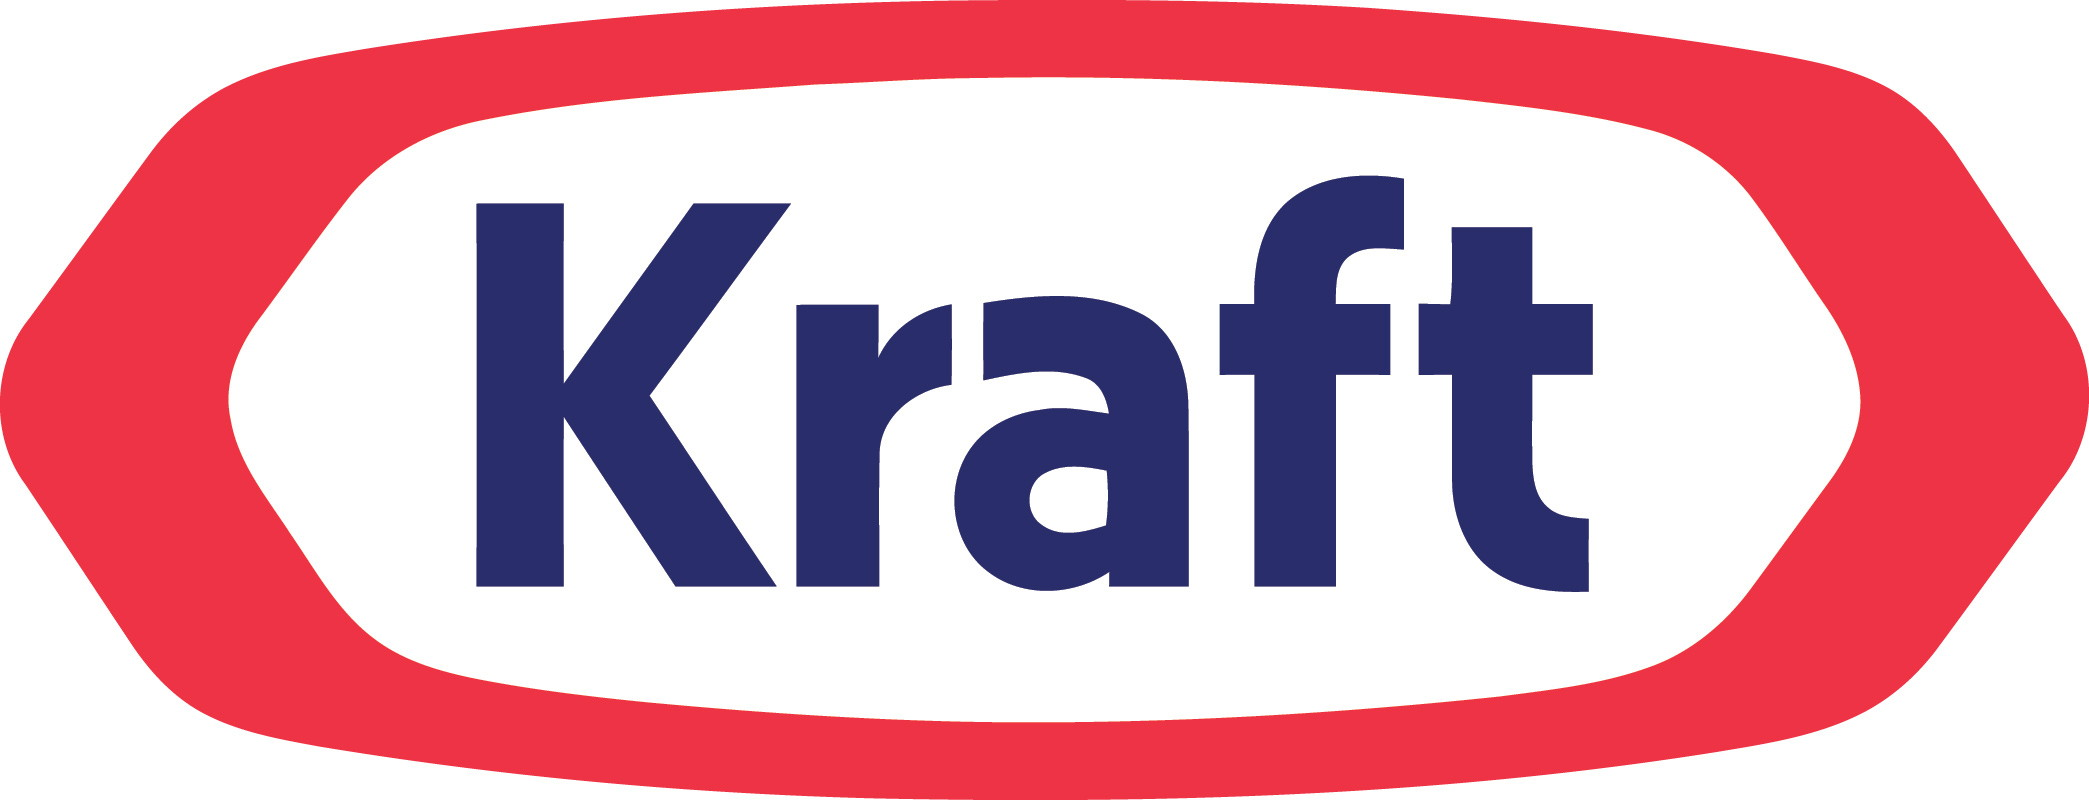 graphic regarding Kraft Coupons Printable named Kraft Discount coupons - The Krazy Coupon Girl